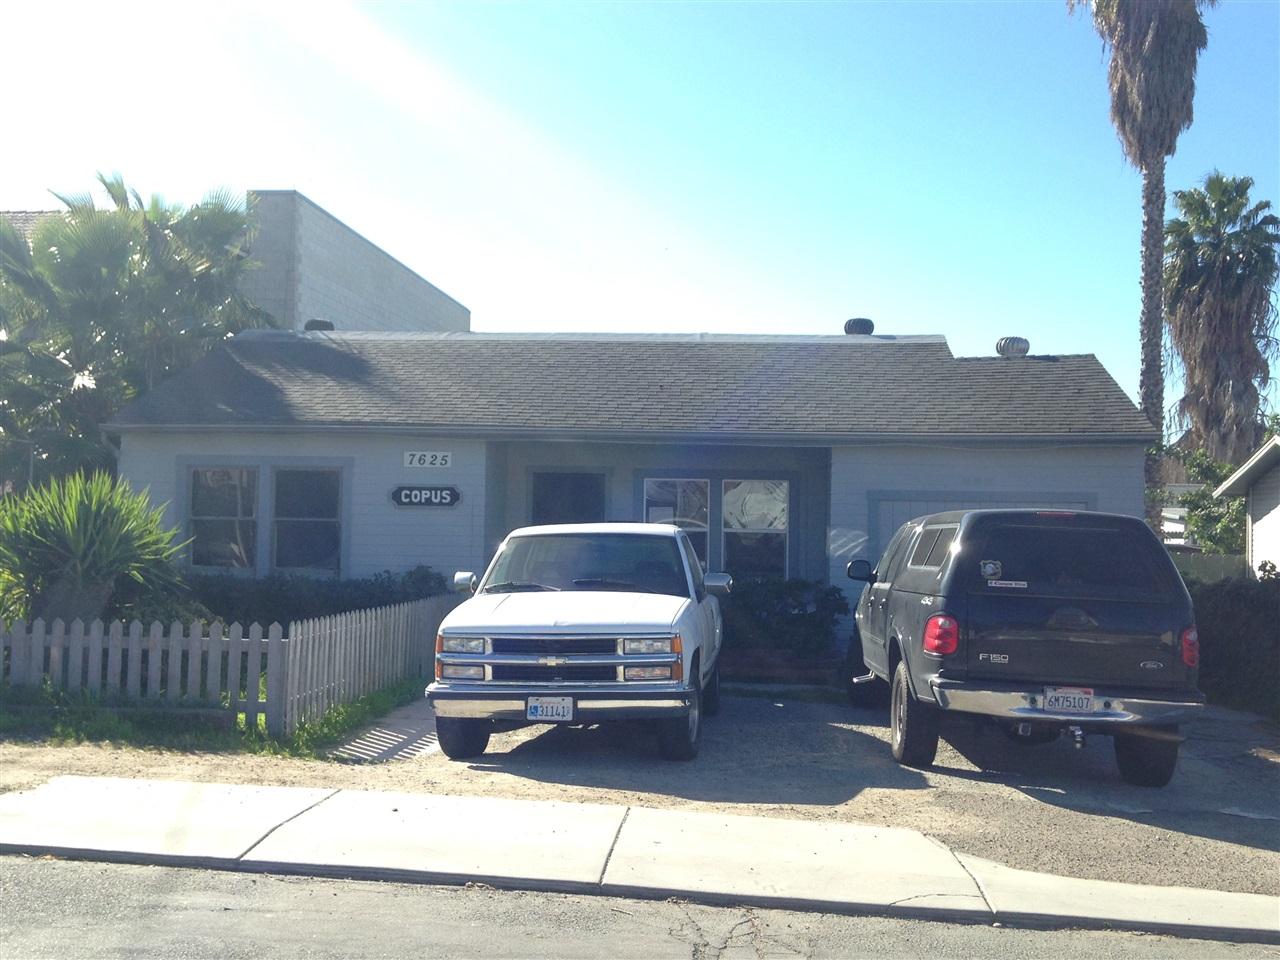 7623 North, Lemon Grove, CA 91945